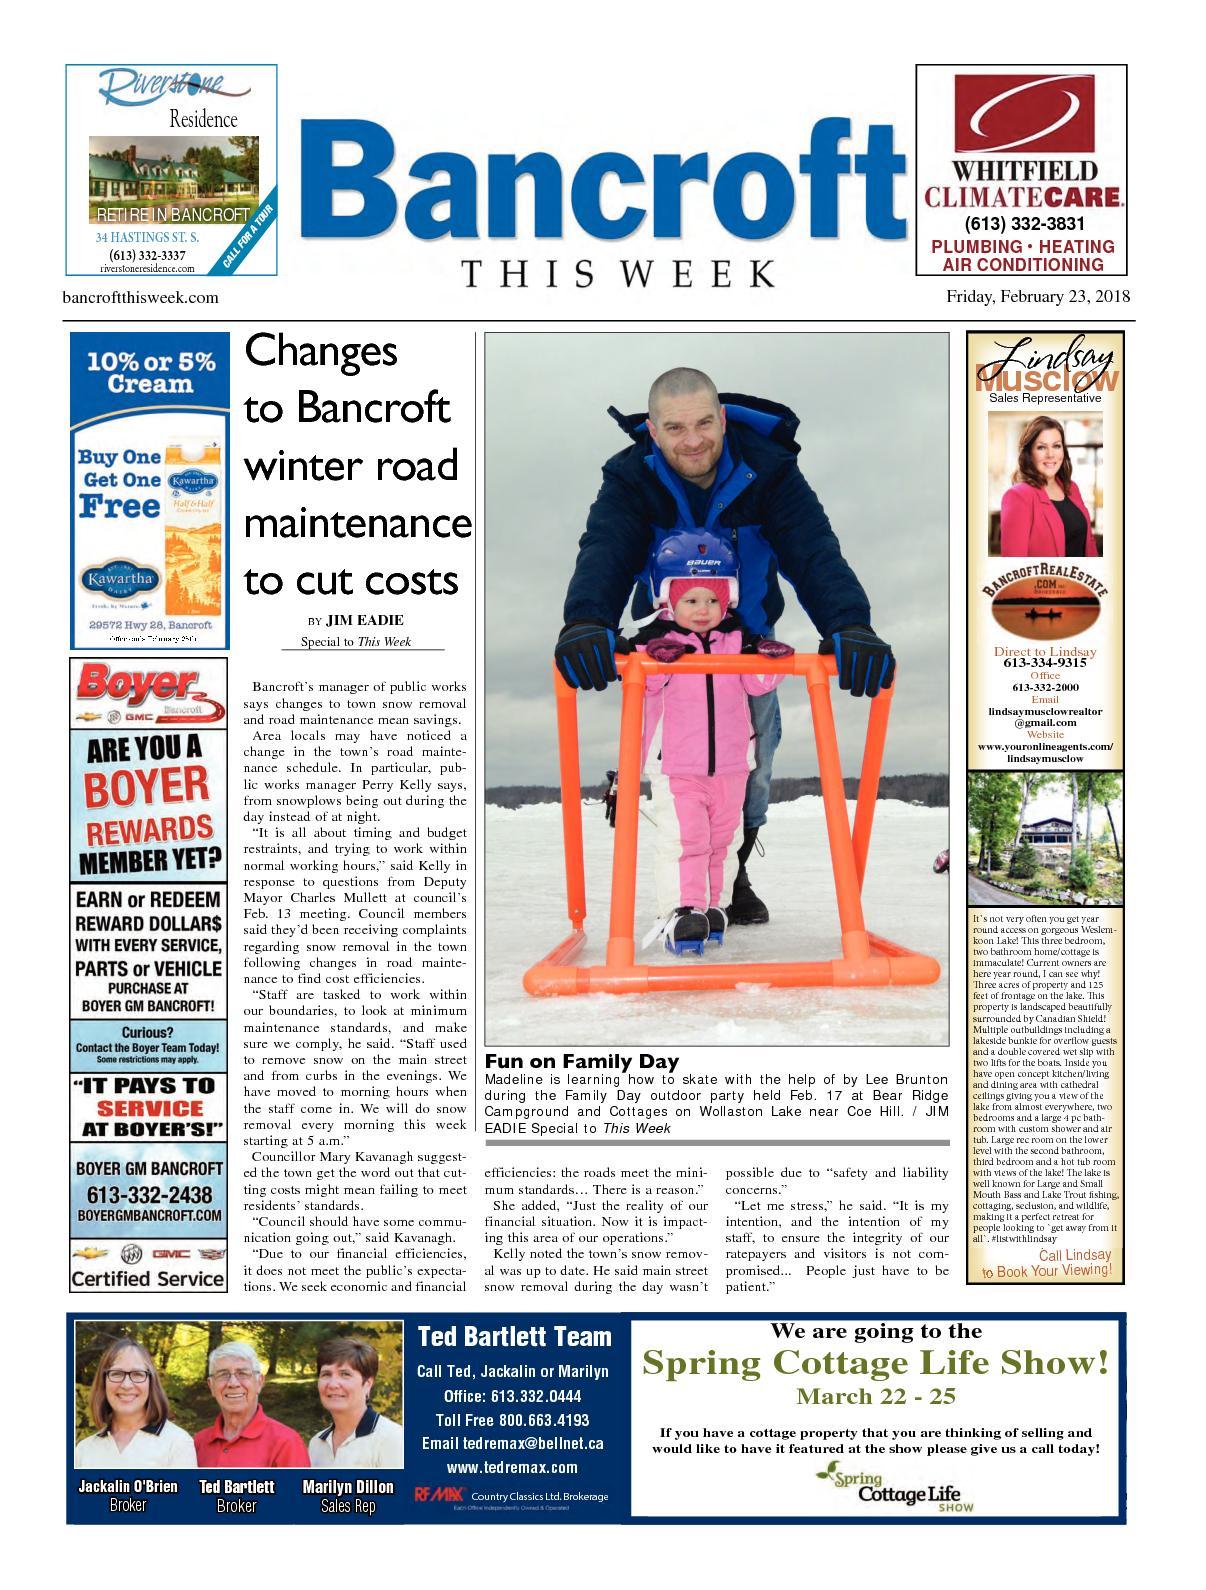 Calaméo - Bancroft This Week Feb 23, 2018